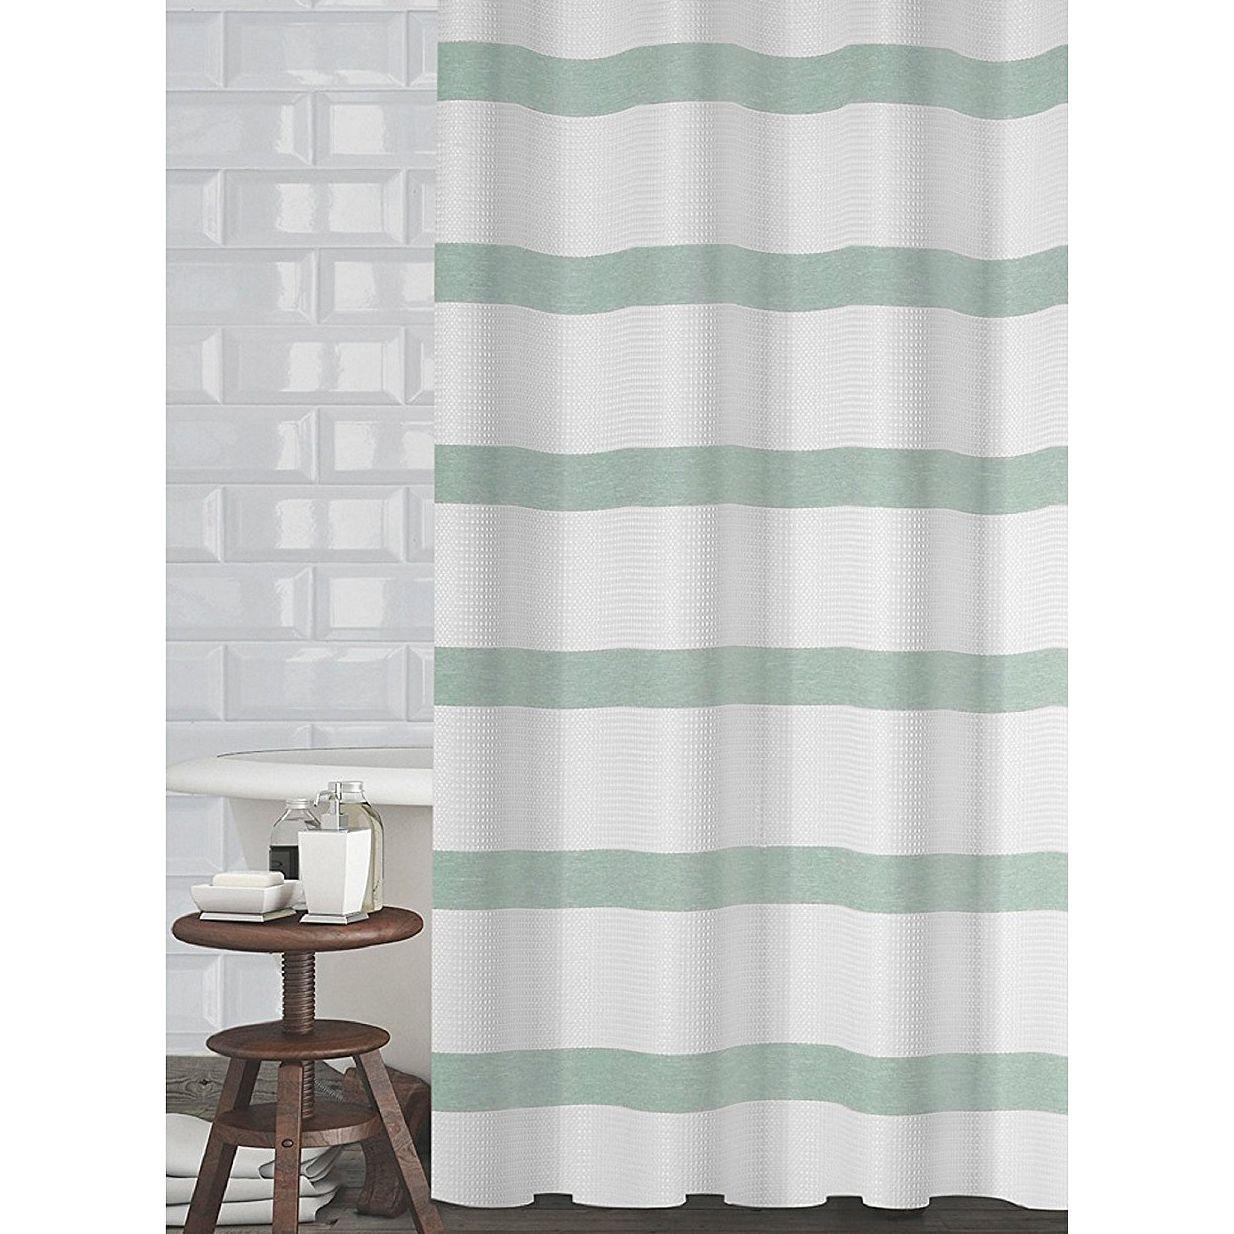 Mint Green Shower Curtain Fabric Di 2020 Hidup Sehat